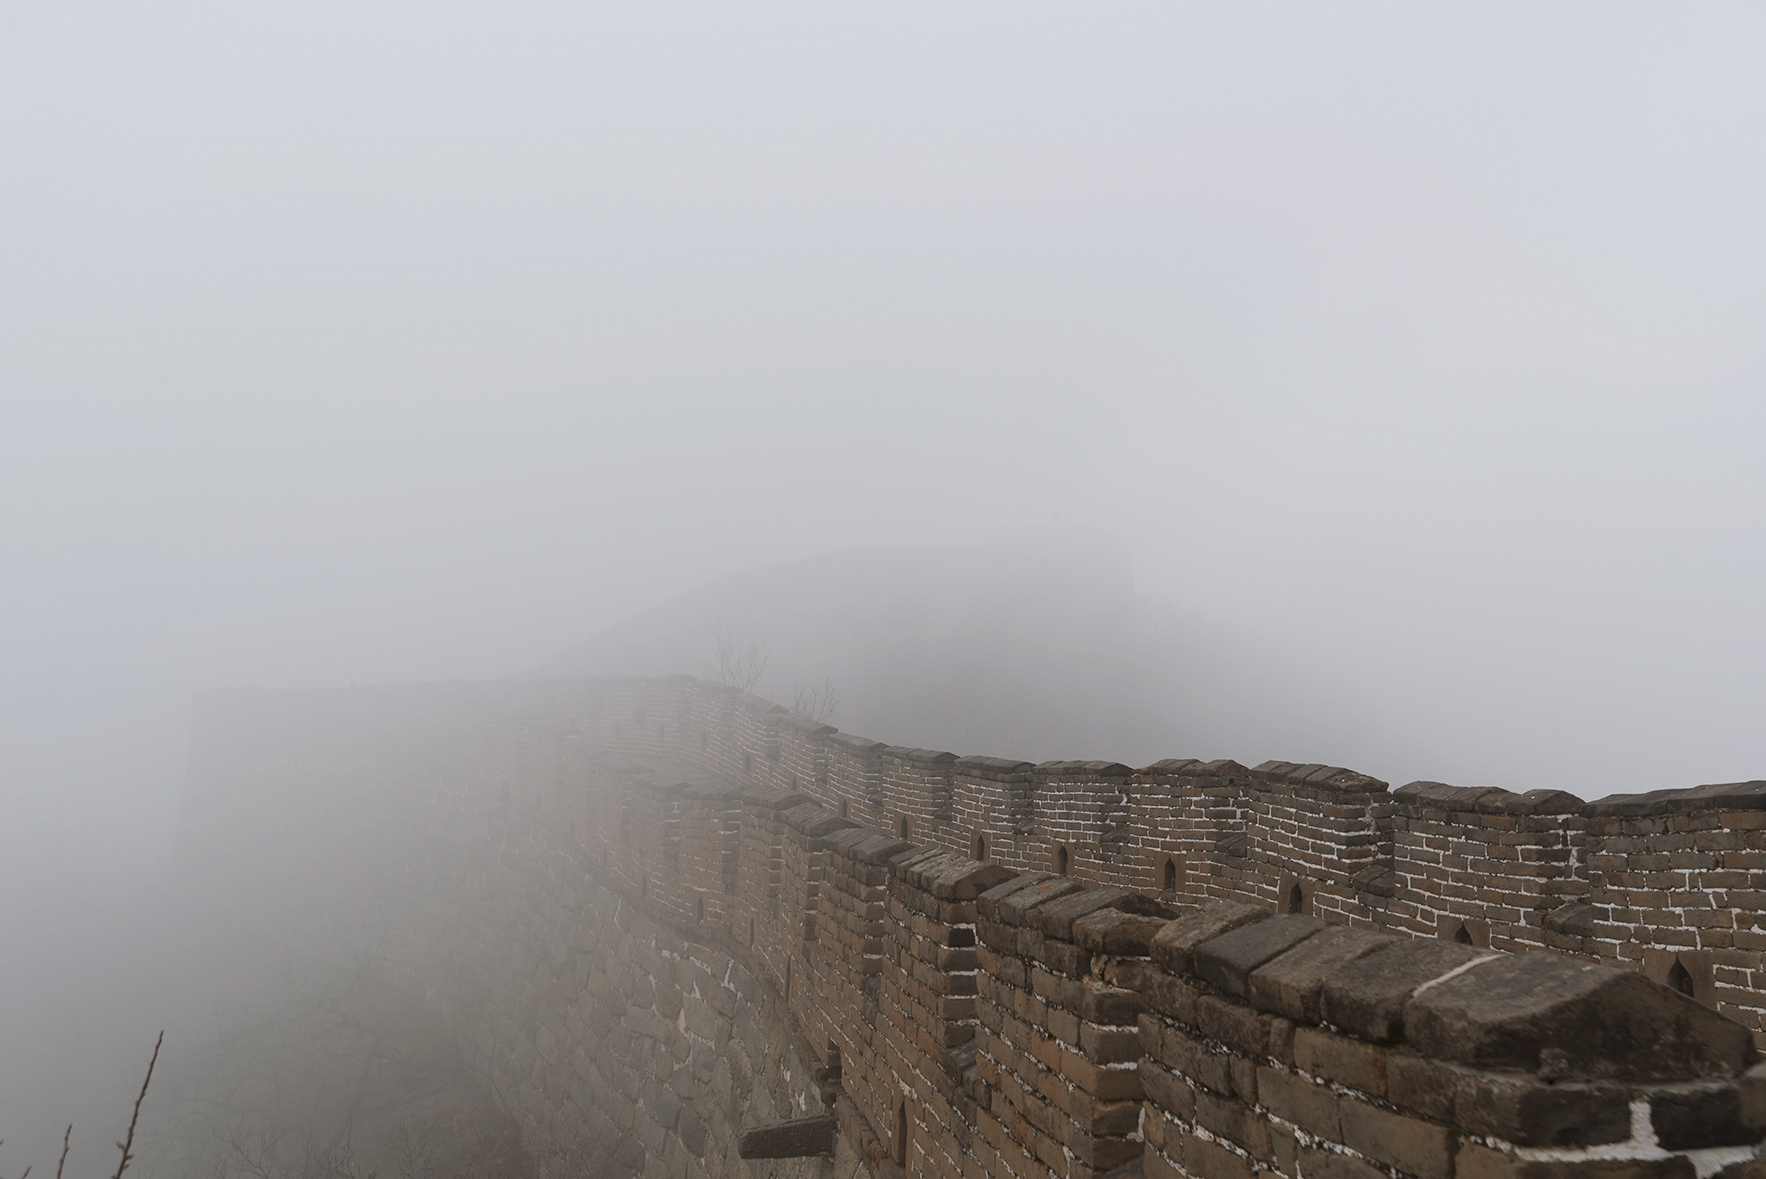 Foto de la niebla cubriendo la muralla china